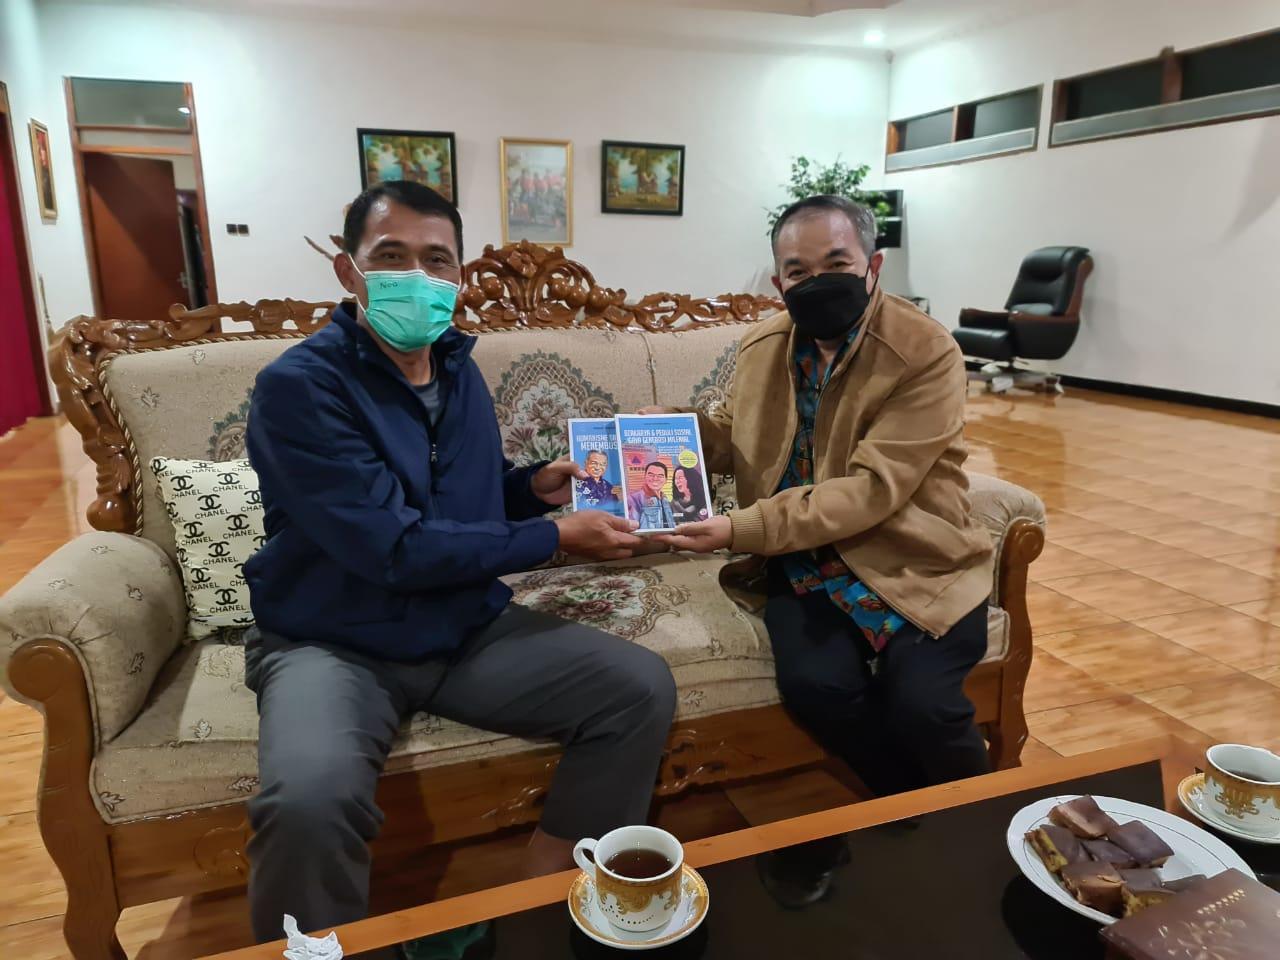 Danrem 081/DSJ Madiun, Kolonel Inf Waris Ari Nugroho, menerima buku Trilogi The Power of Silaturahim dari Dr Aqua Dwipayana. (Foto: Dokumen/Tugu Jatim)